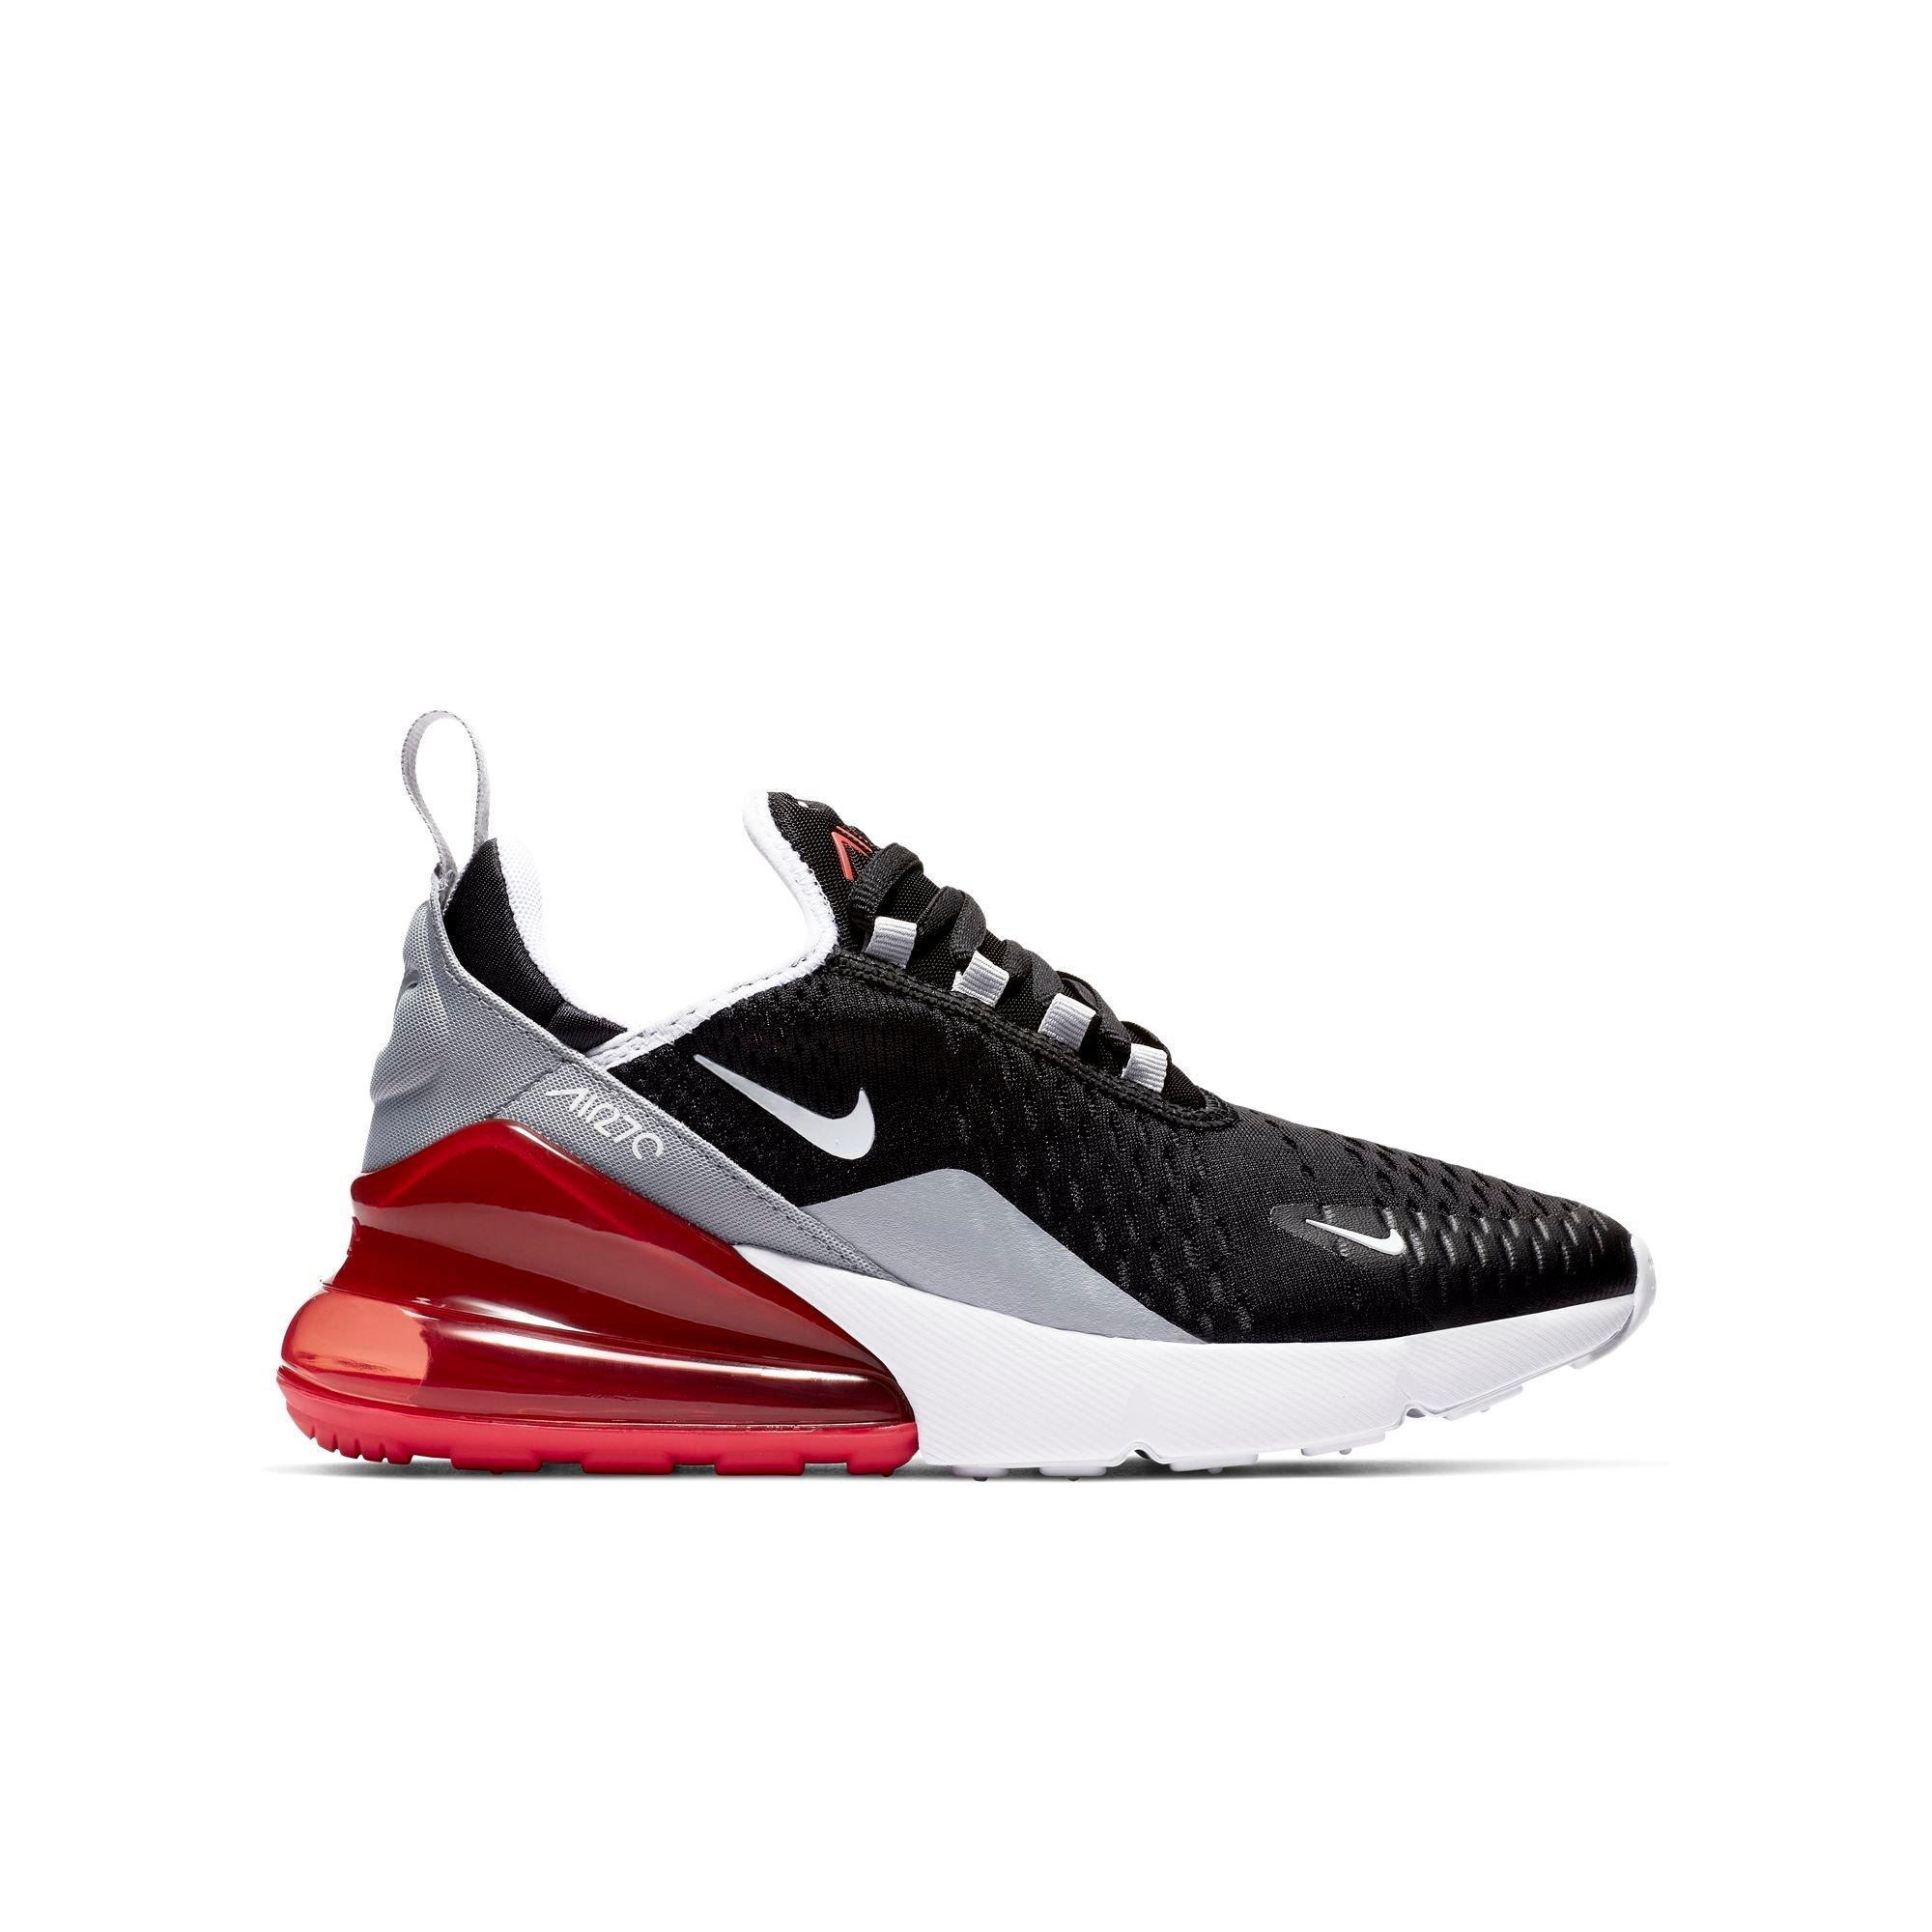 Nike Air Max 97+720 Black Red Running shoes Wmns NIKE CIU014266